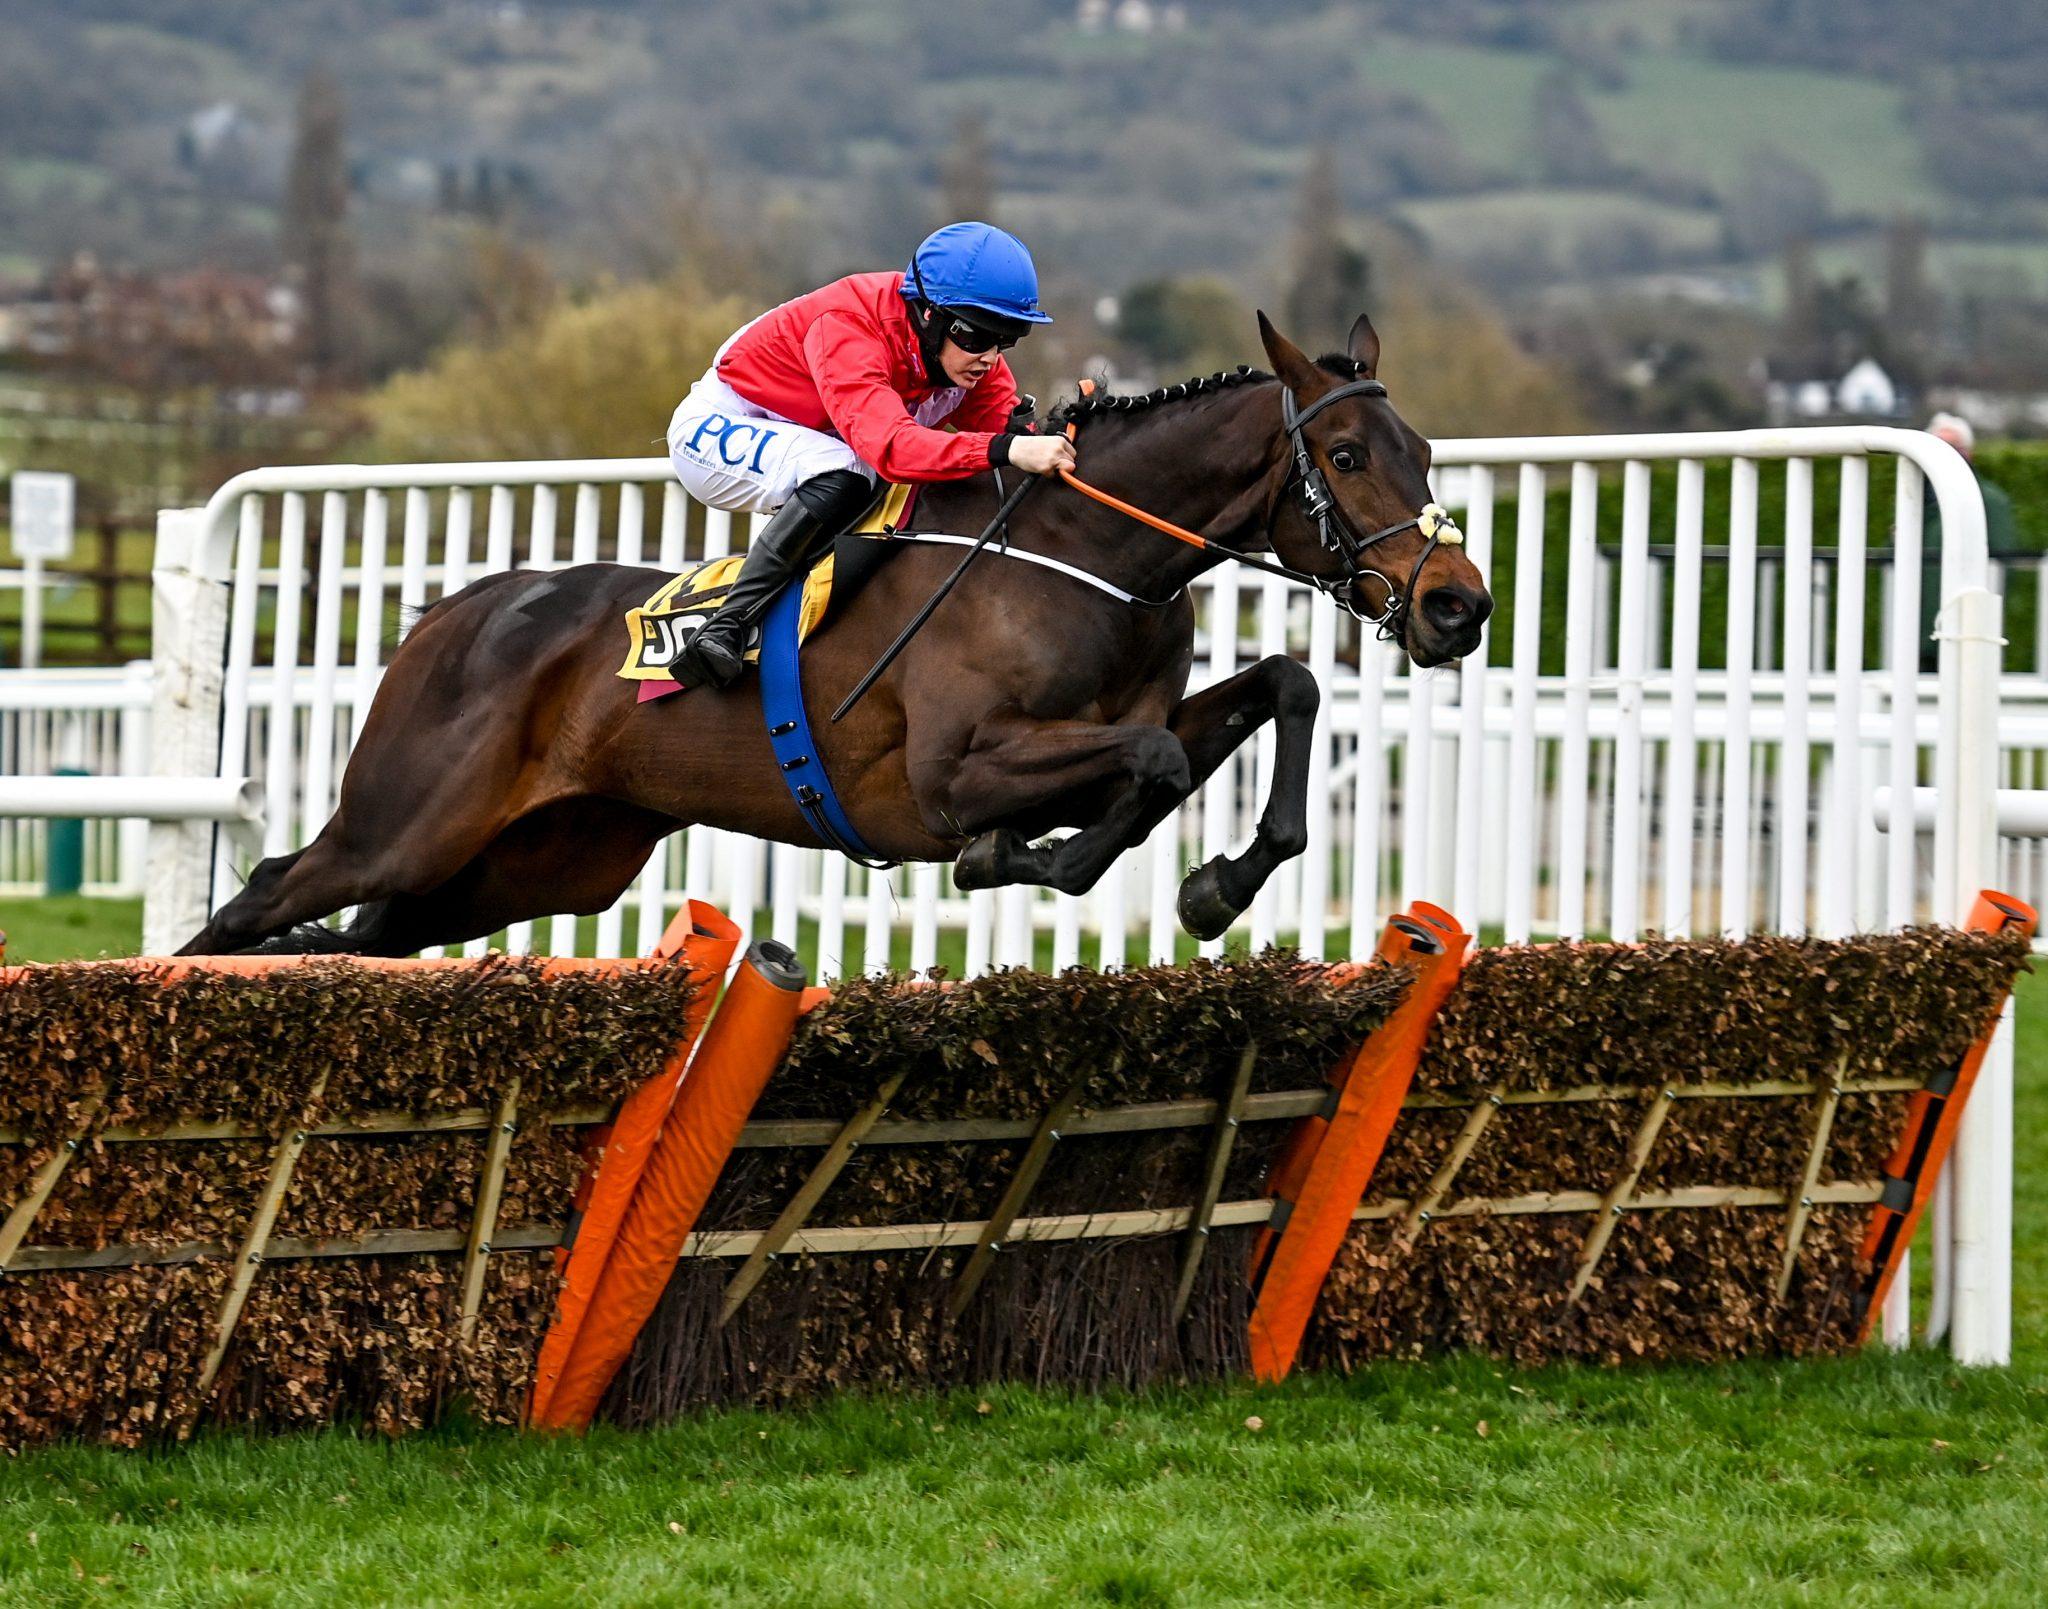 Blackmore Ireland Horse